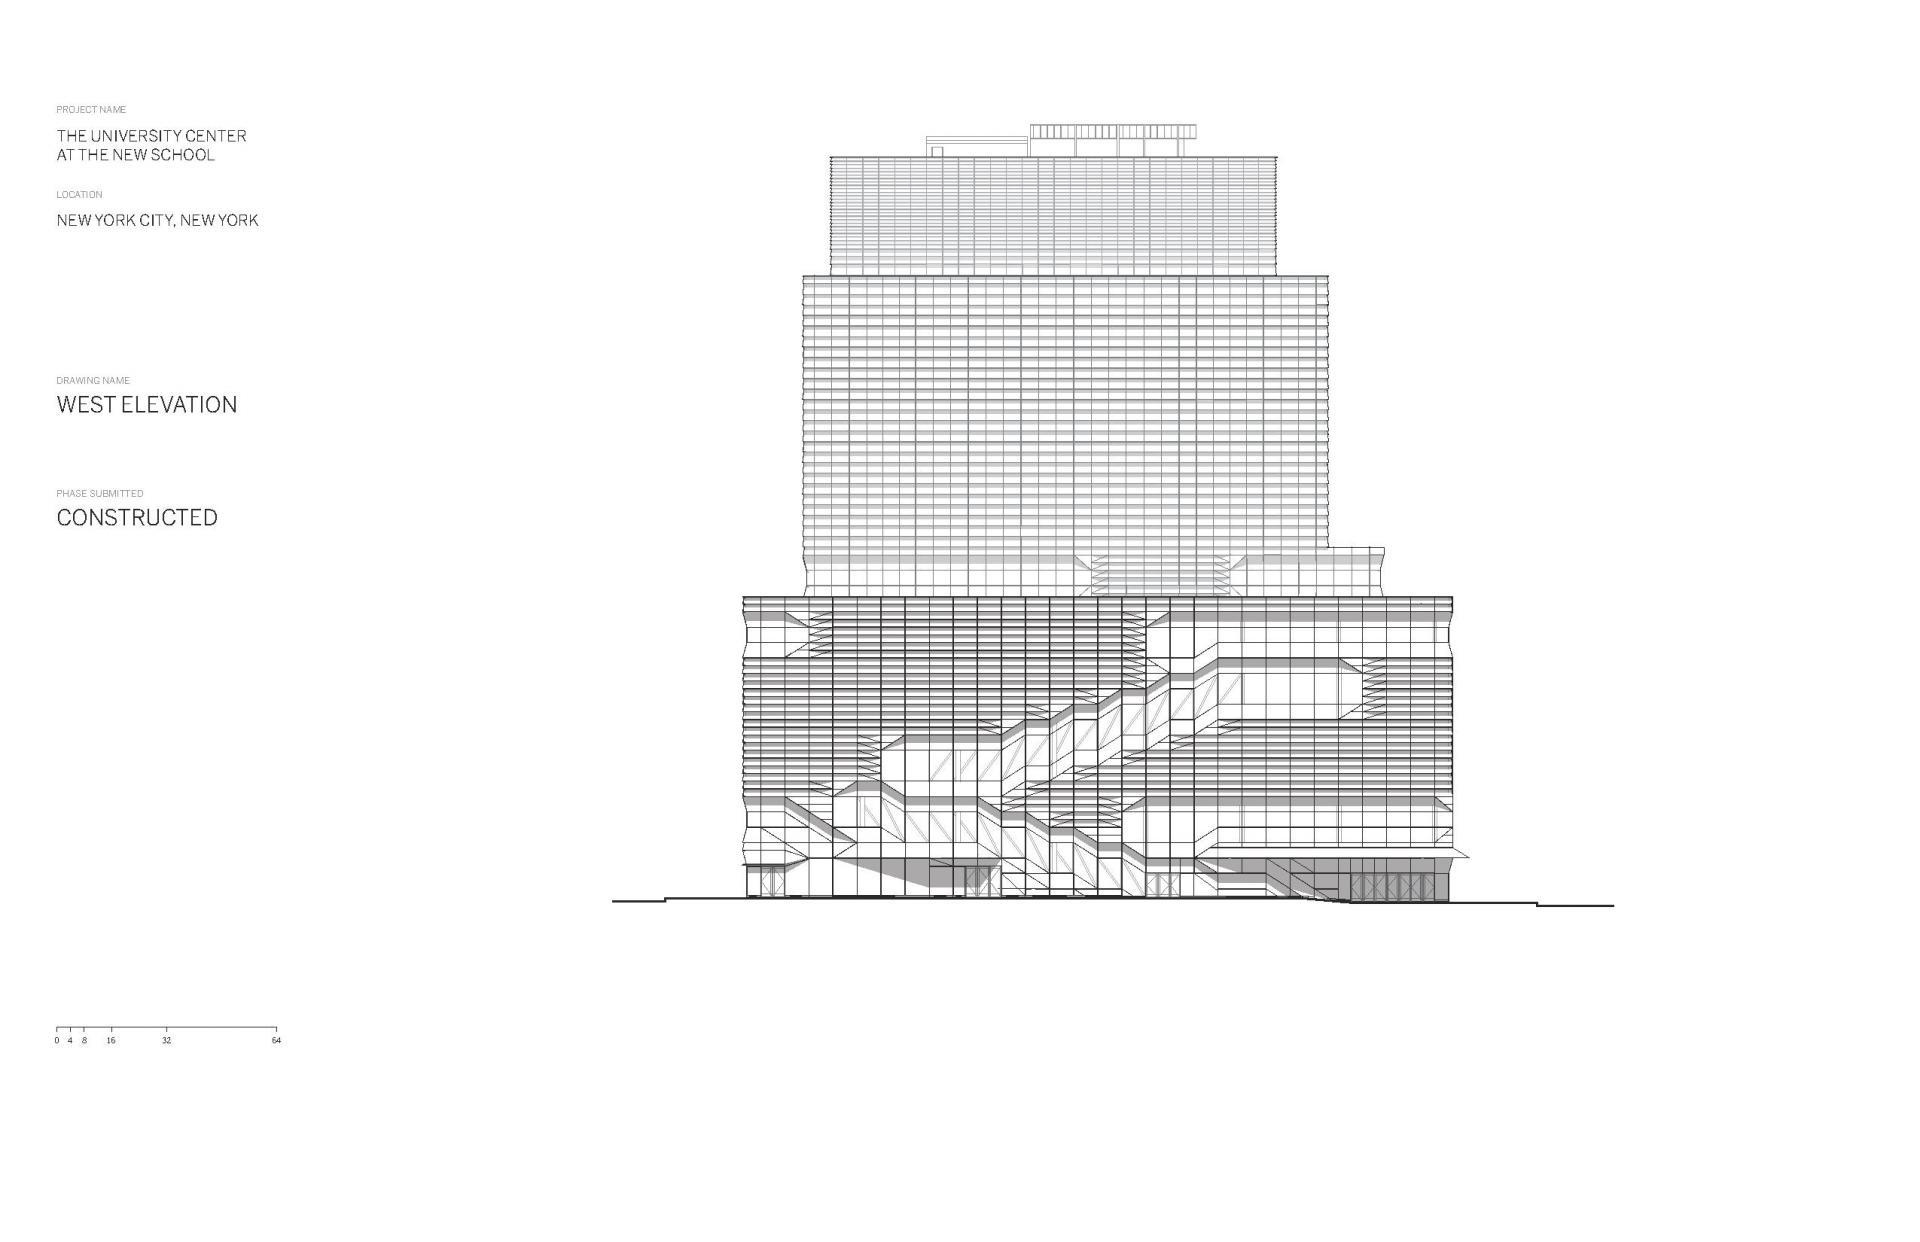 Схема учебного центра Greenwich Village в Нью Йорке - Фото 13